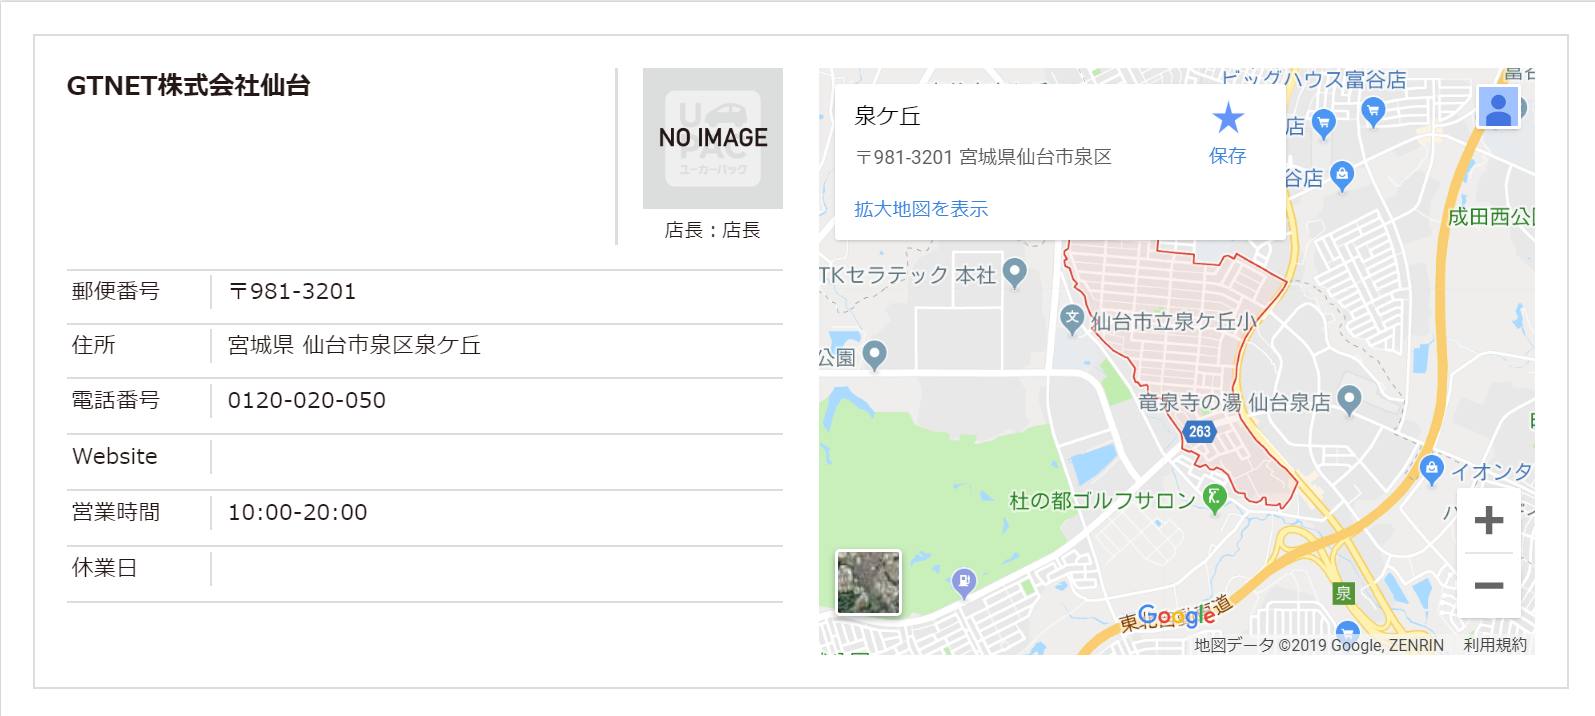 GTNET株式会社仙台